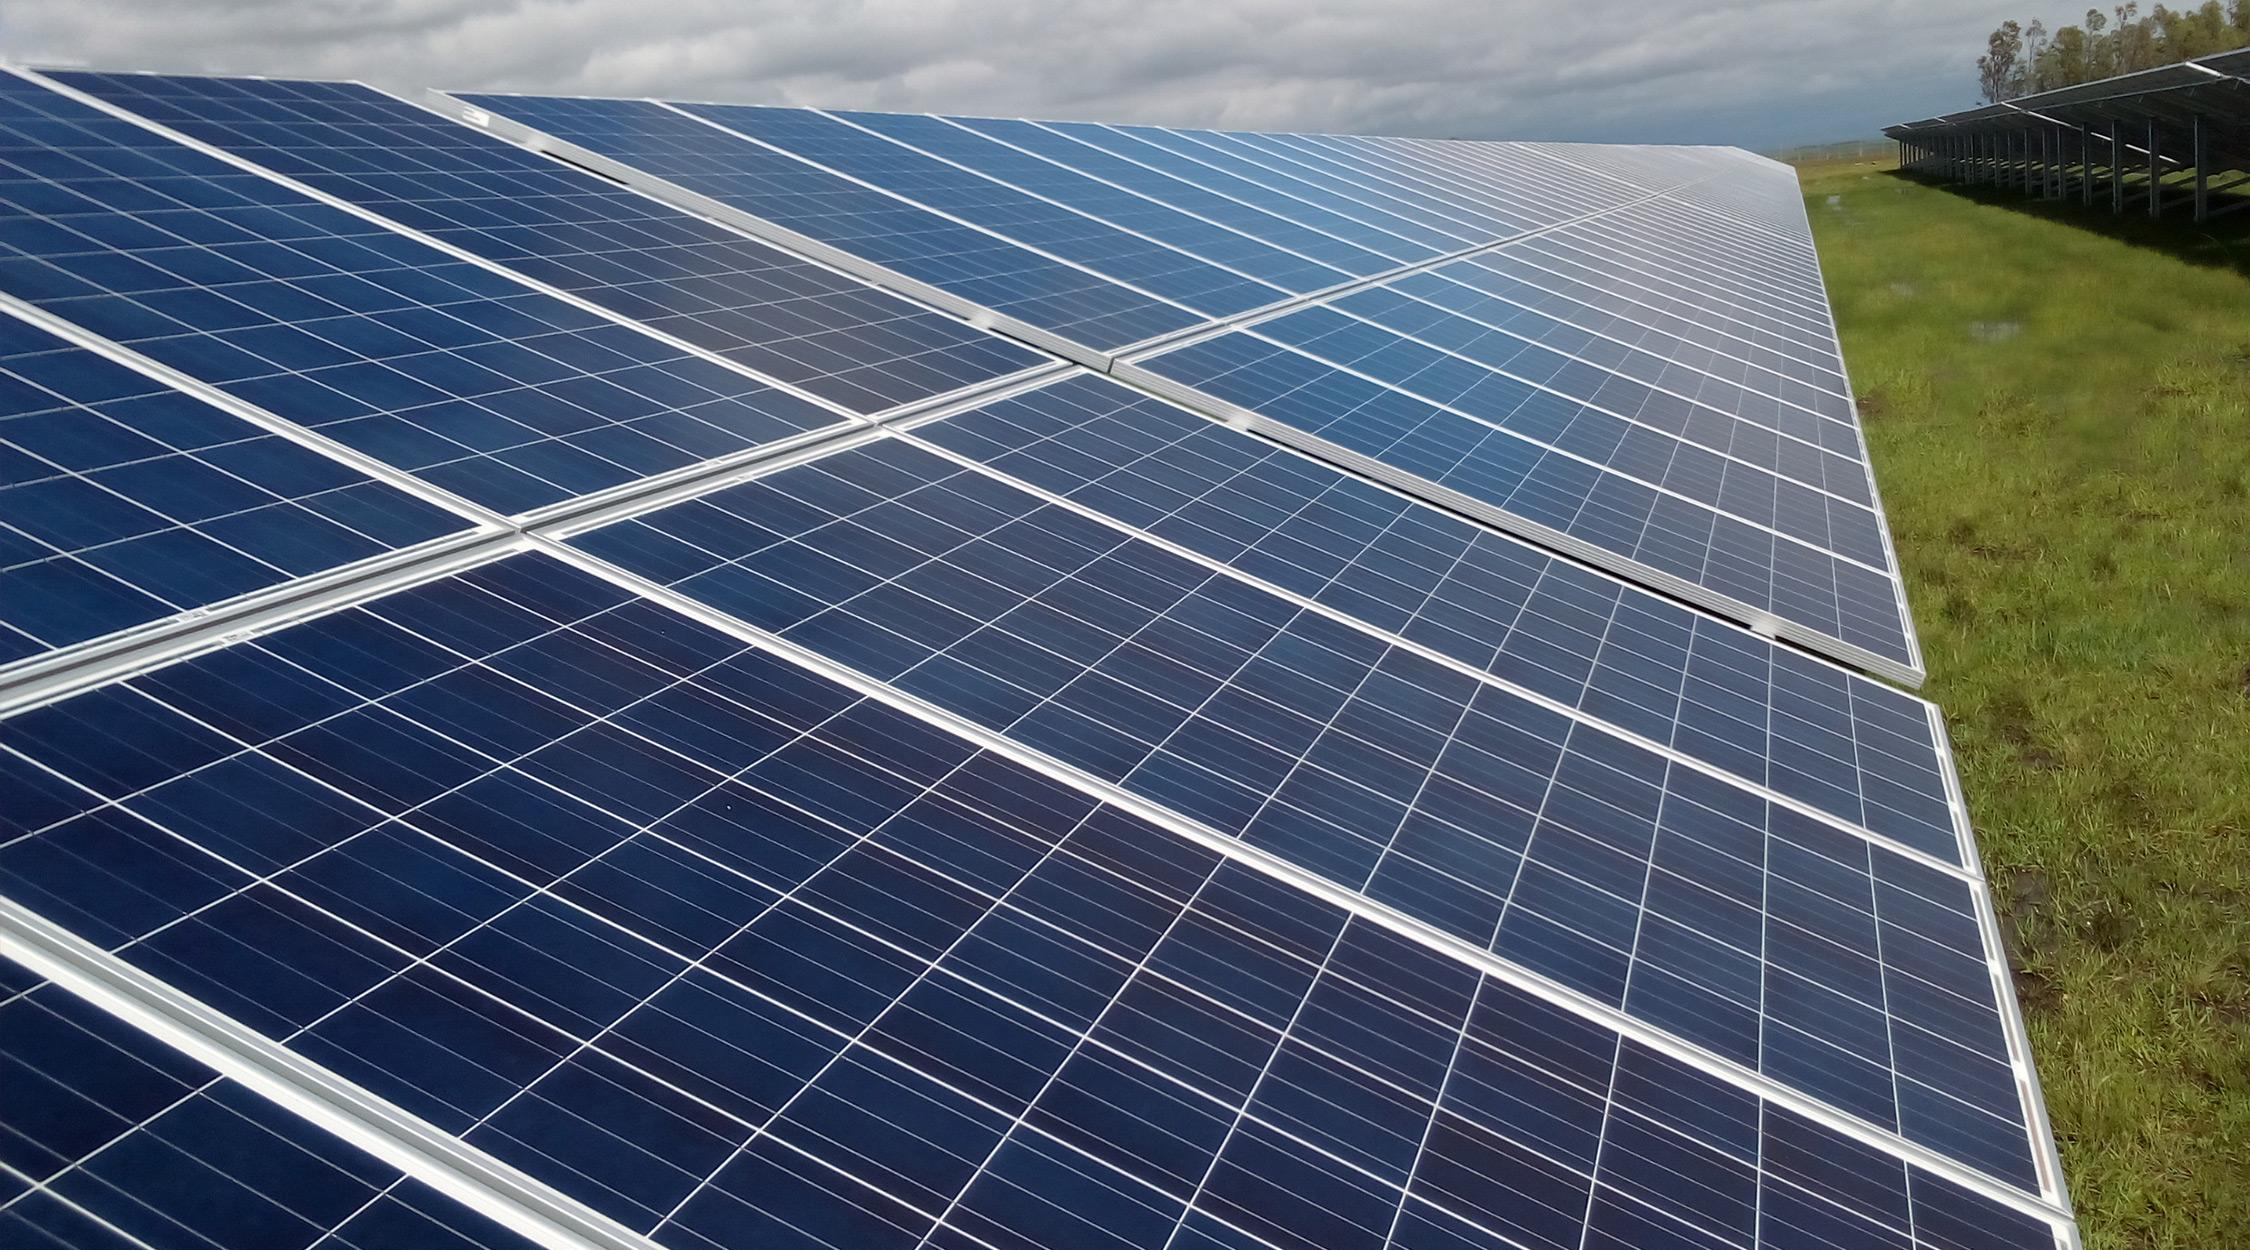 Solarpack incrementa sus ingresos operativos un 222%